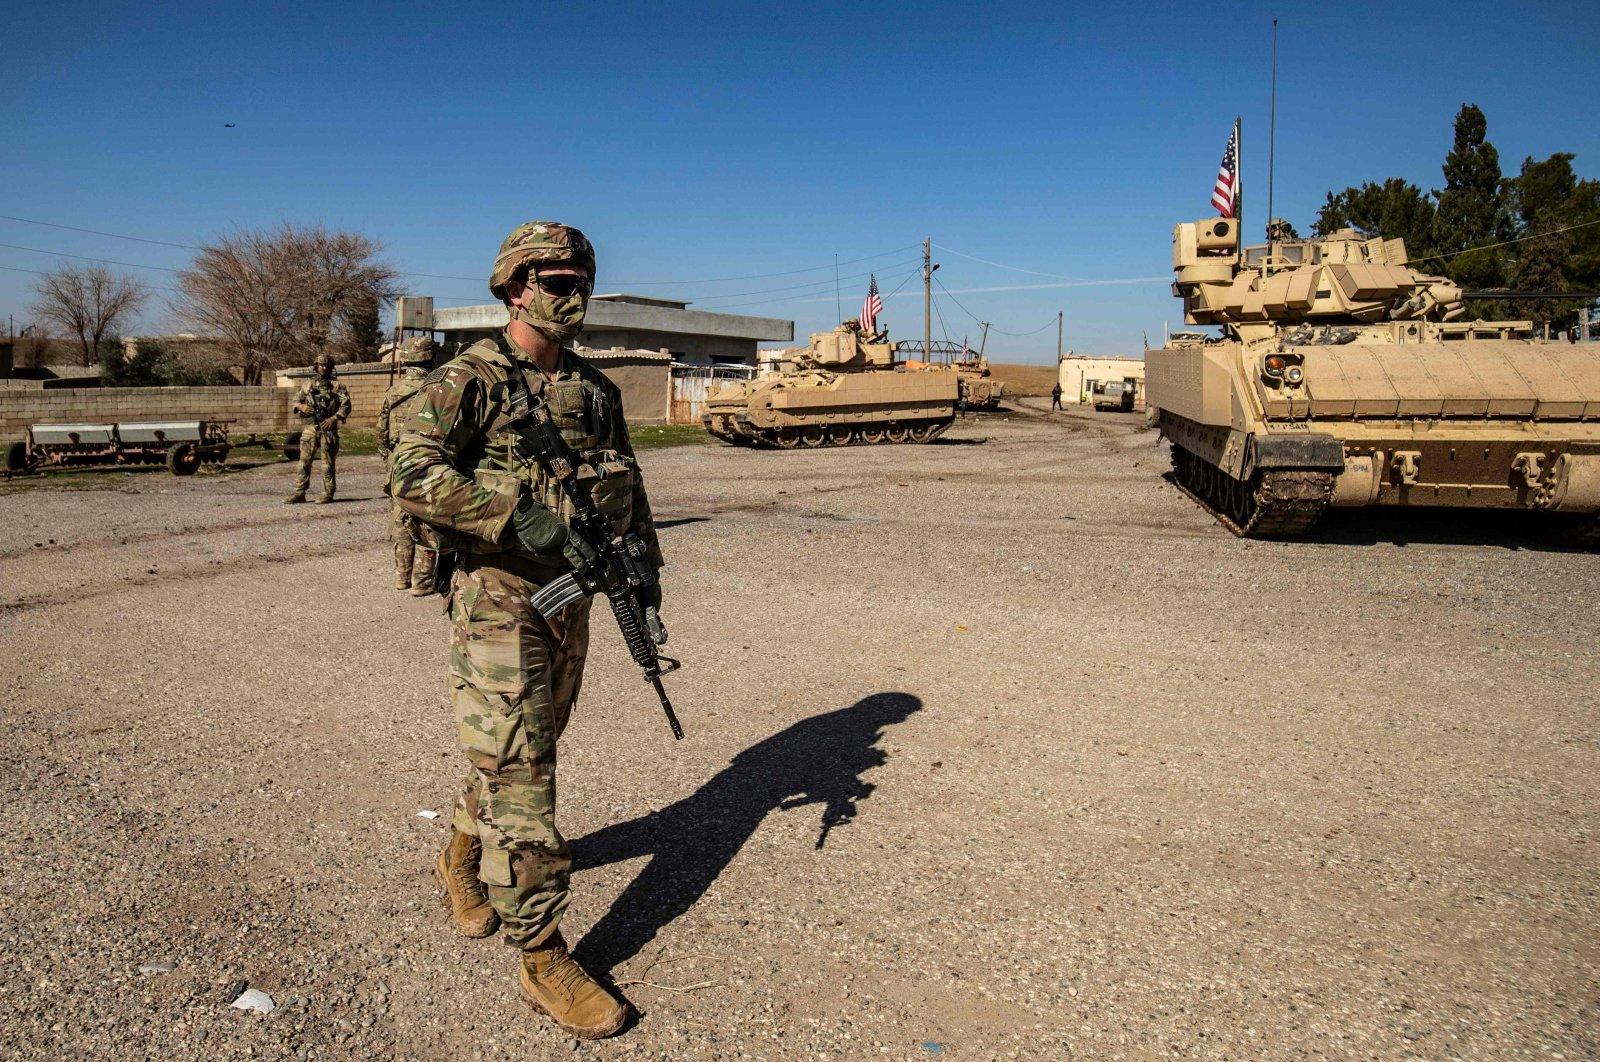 A U.S. soldier walks near a Bradley Fighting Vehicle (BFV) during a patrol in the countryside near al-Malikiyah (Derik) in Syria's northeastern Hasakah province, Feb. 2, 2021. (AFP Photo)